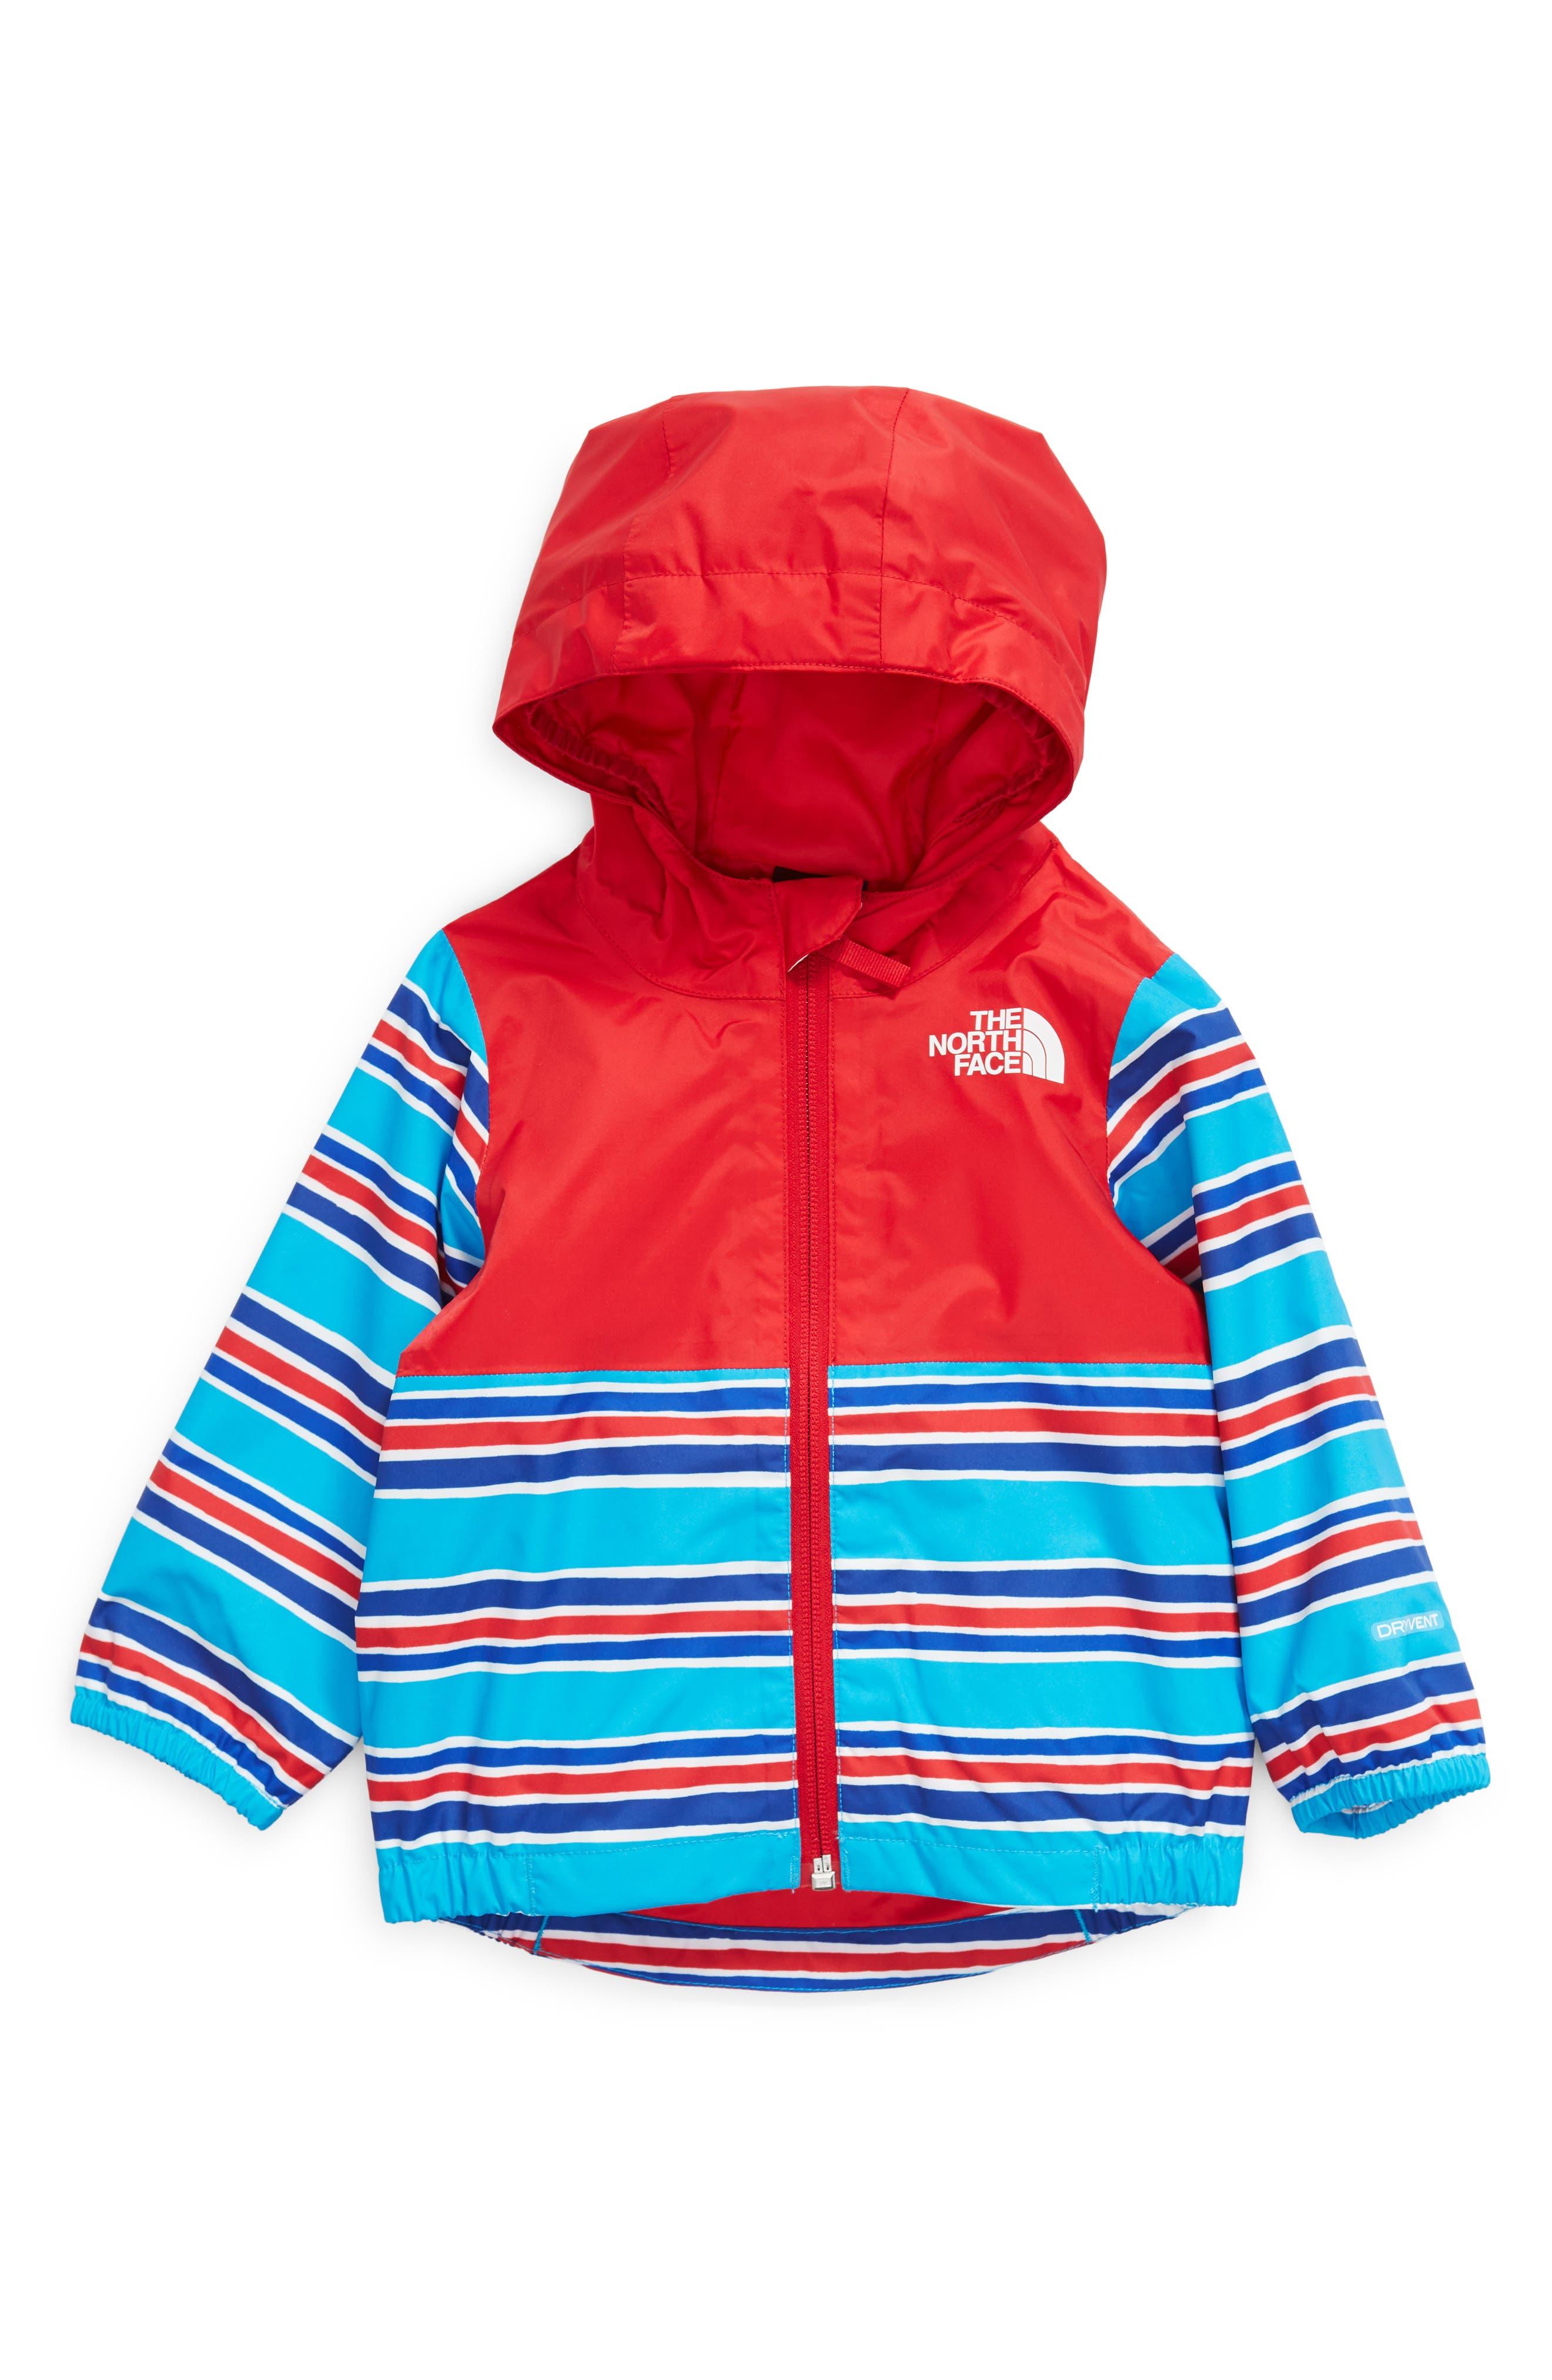 The North Face Infant Zipline Rain Jacket - 3-6M - Meridian Blue Painted Stripe Print -  NF0A53D5050